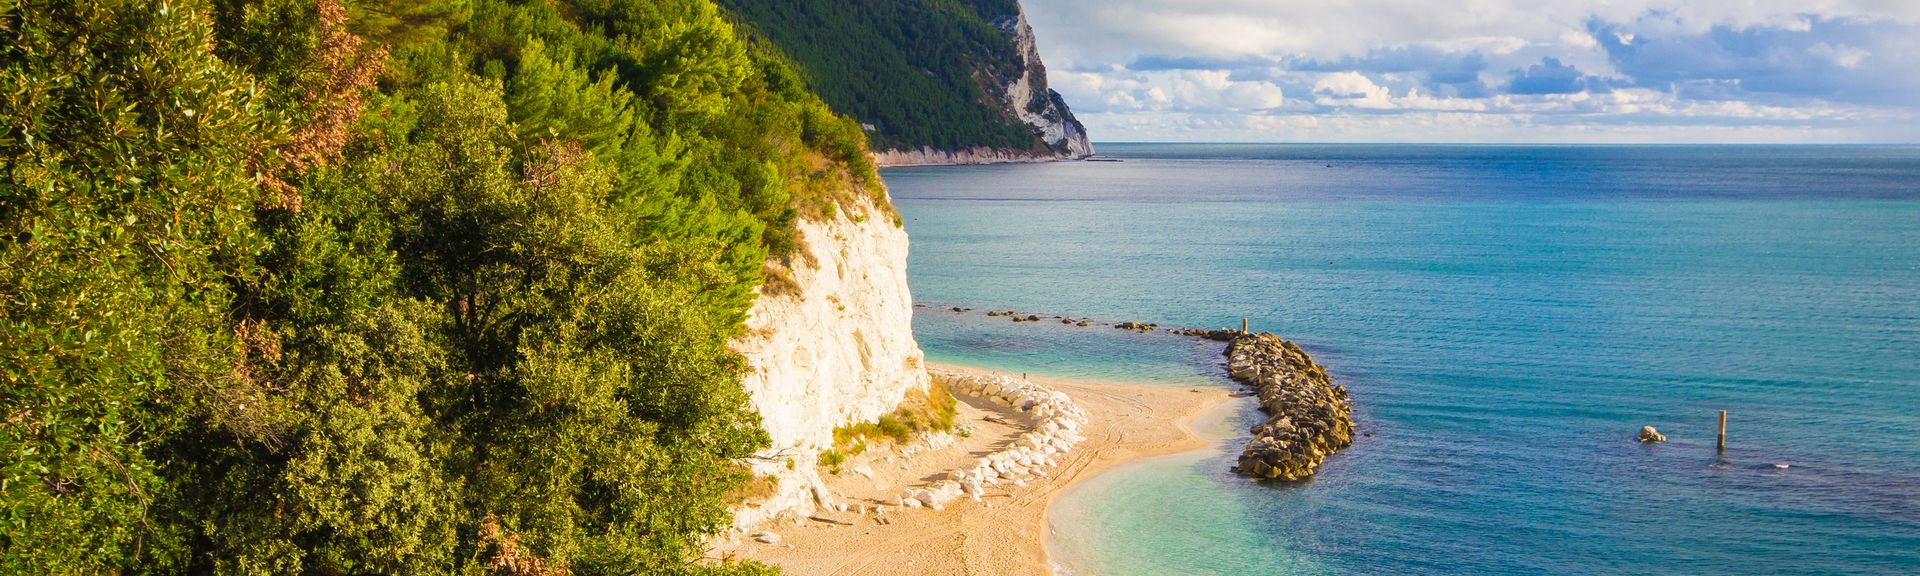 Marcas, Itália